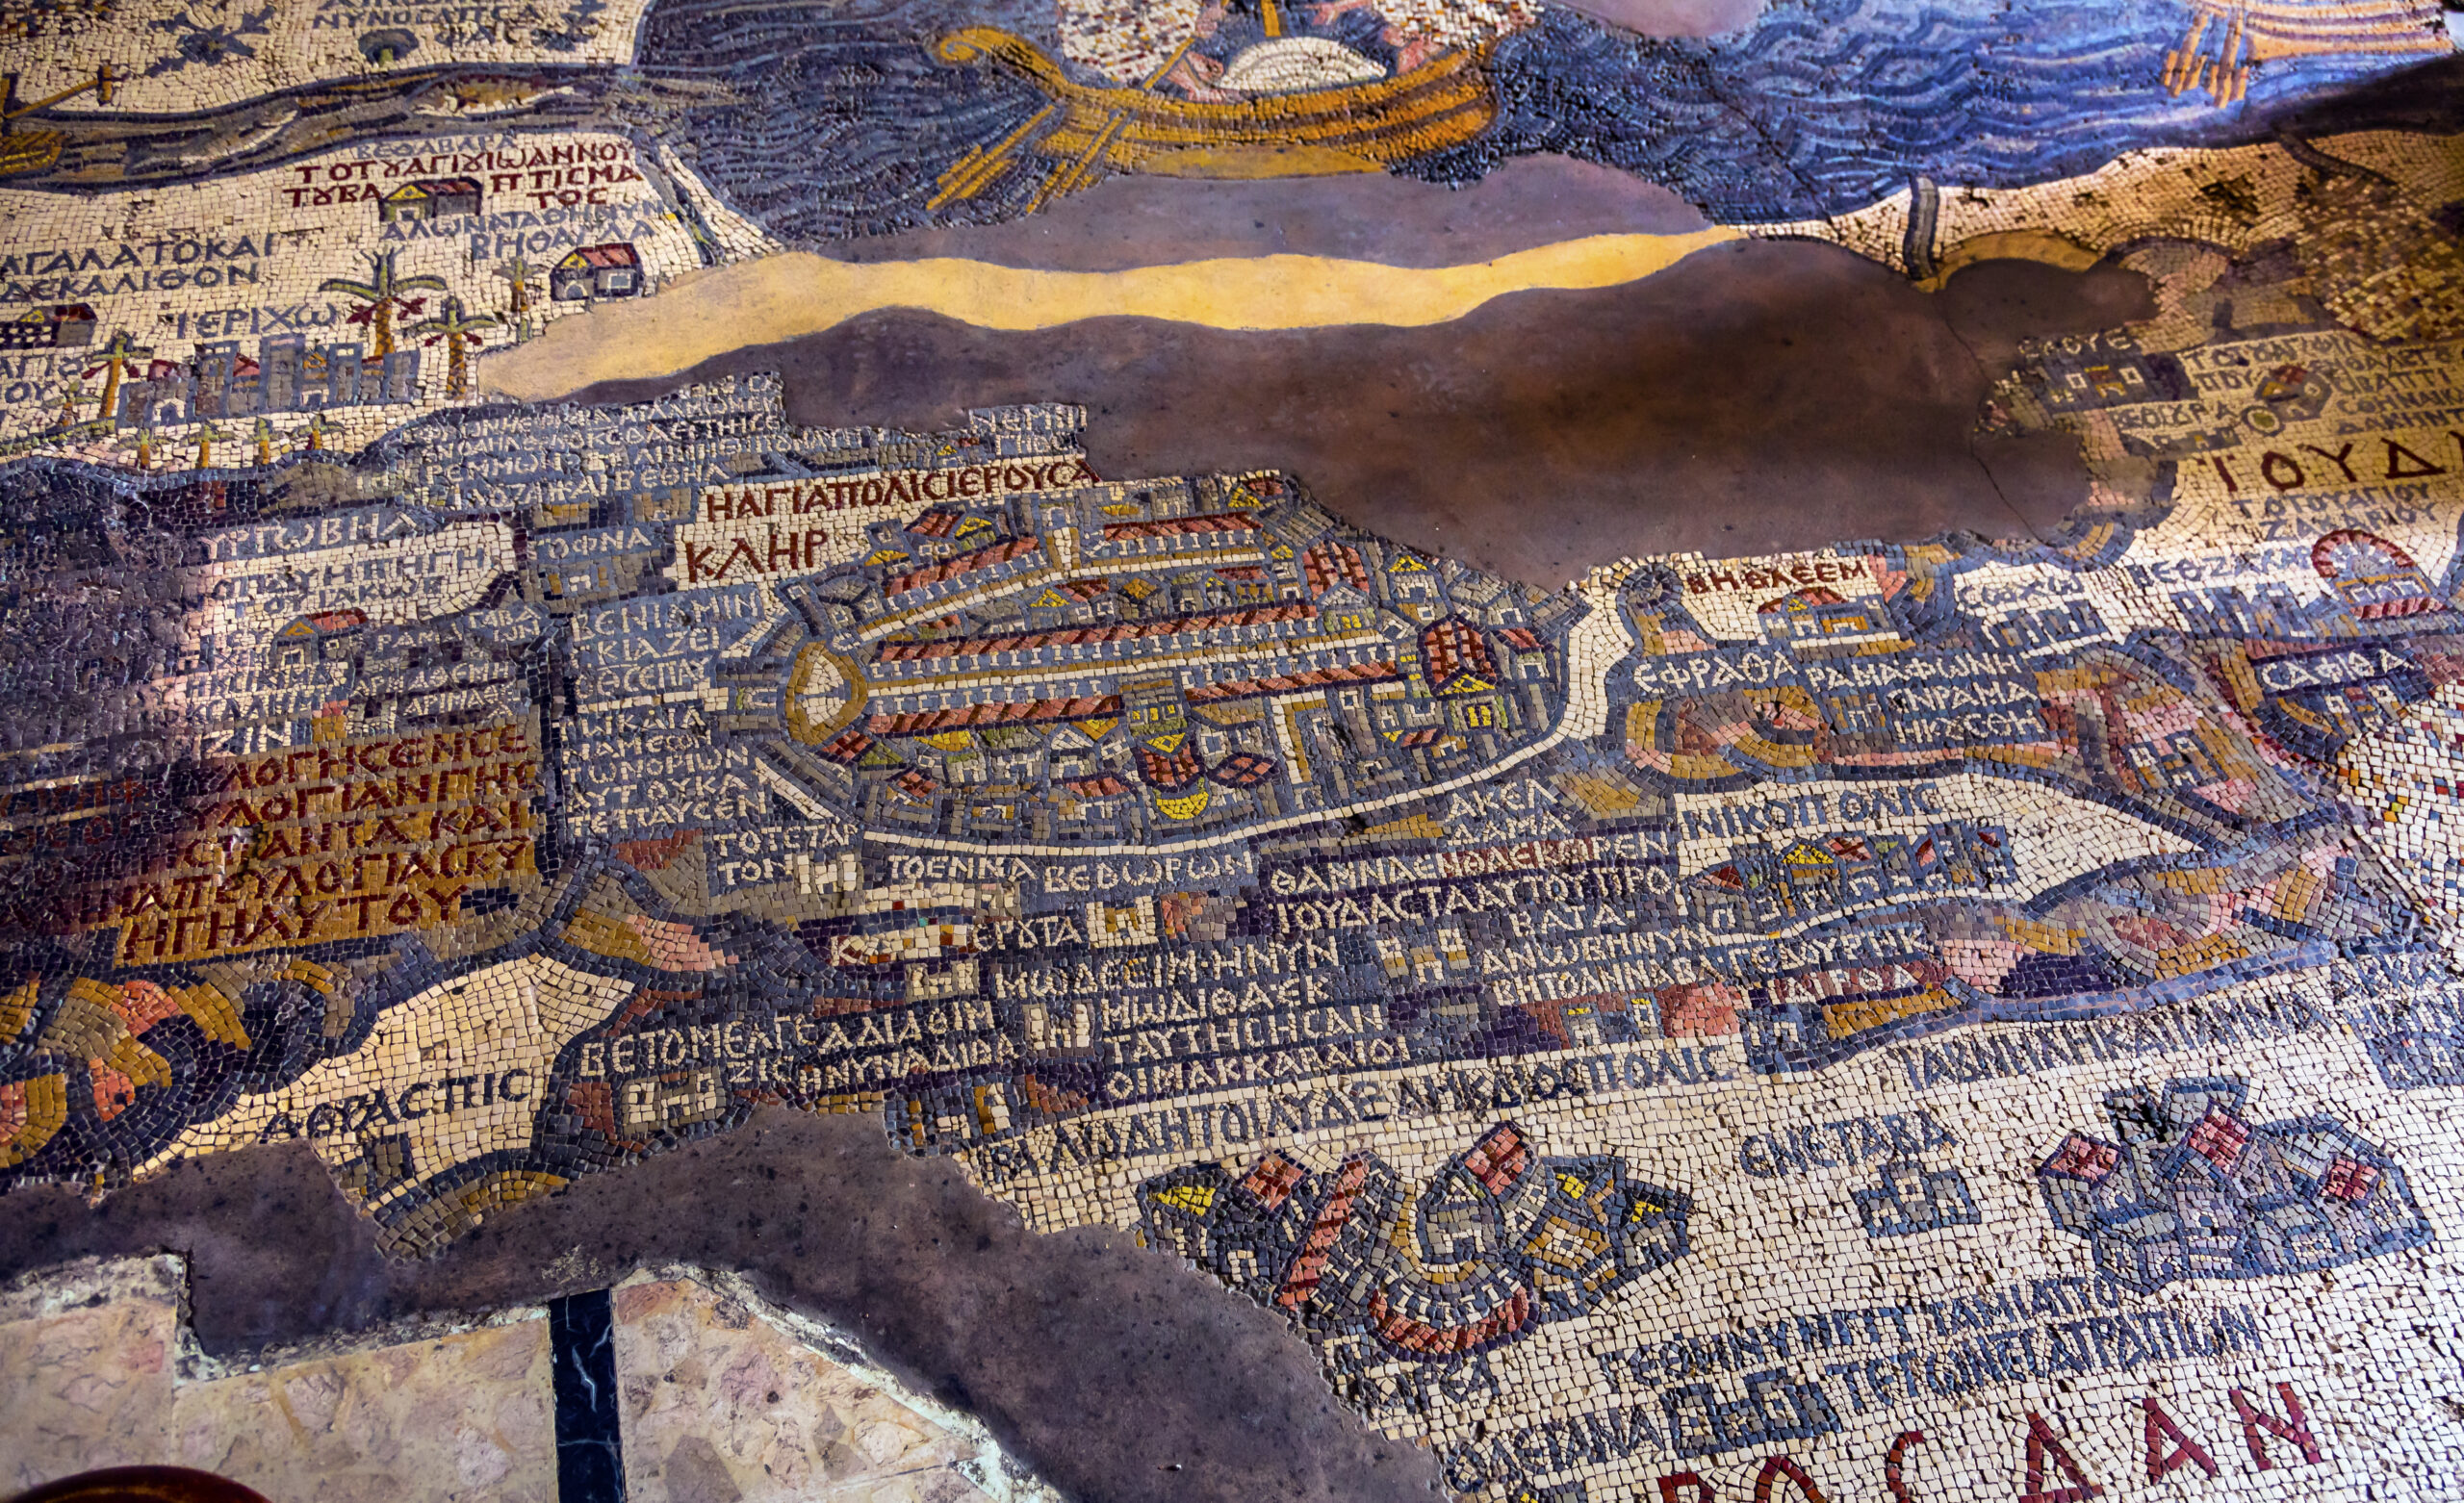 Madaba Map – 6th century Mosaic Map of Jerusalem and the Holy Land